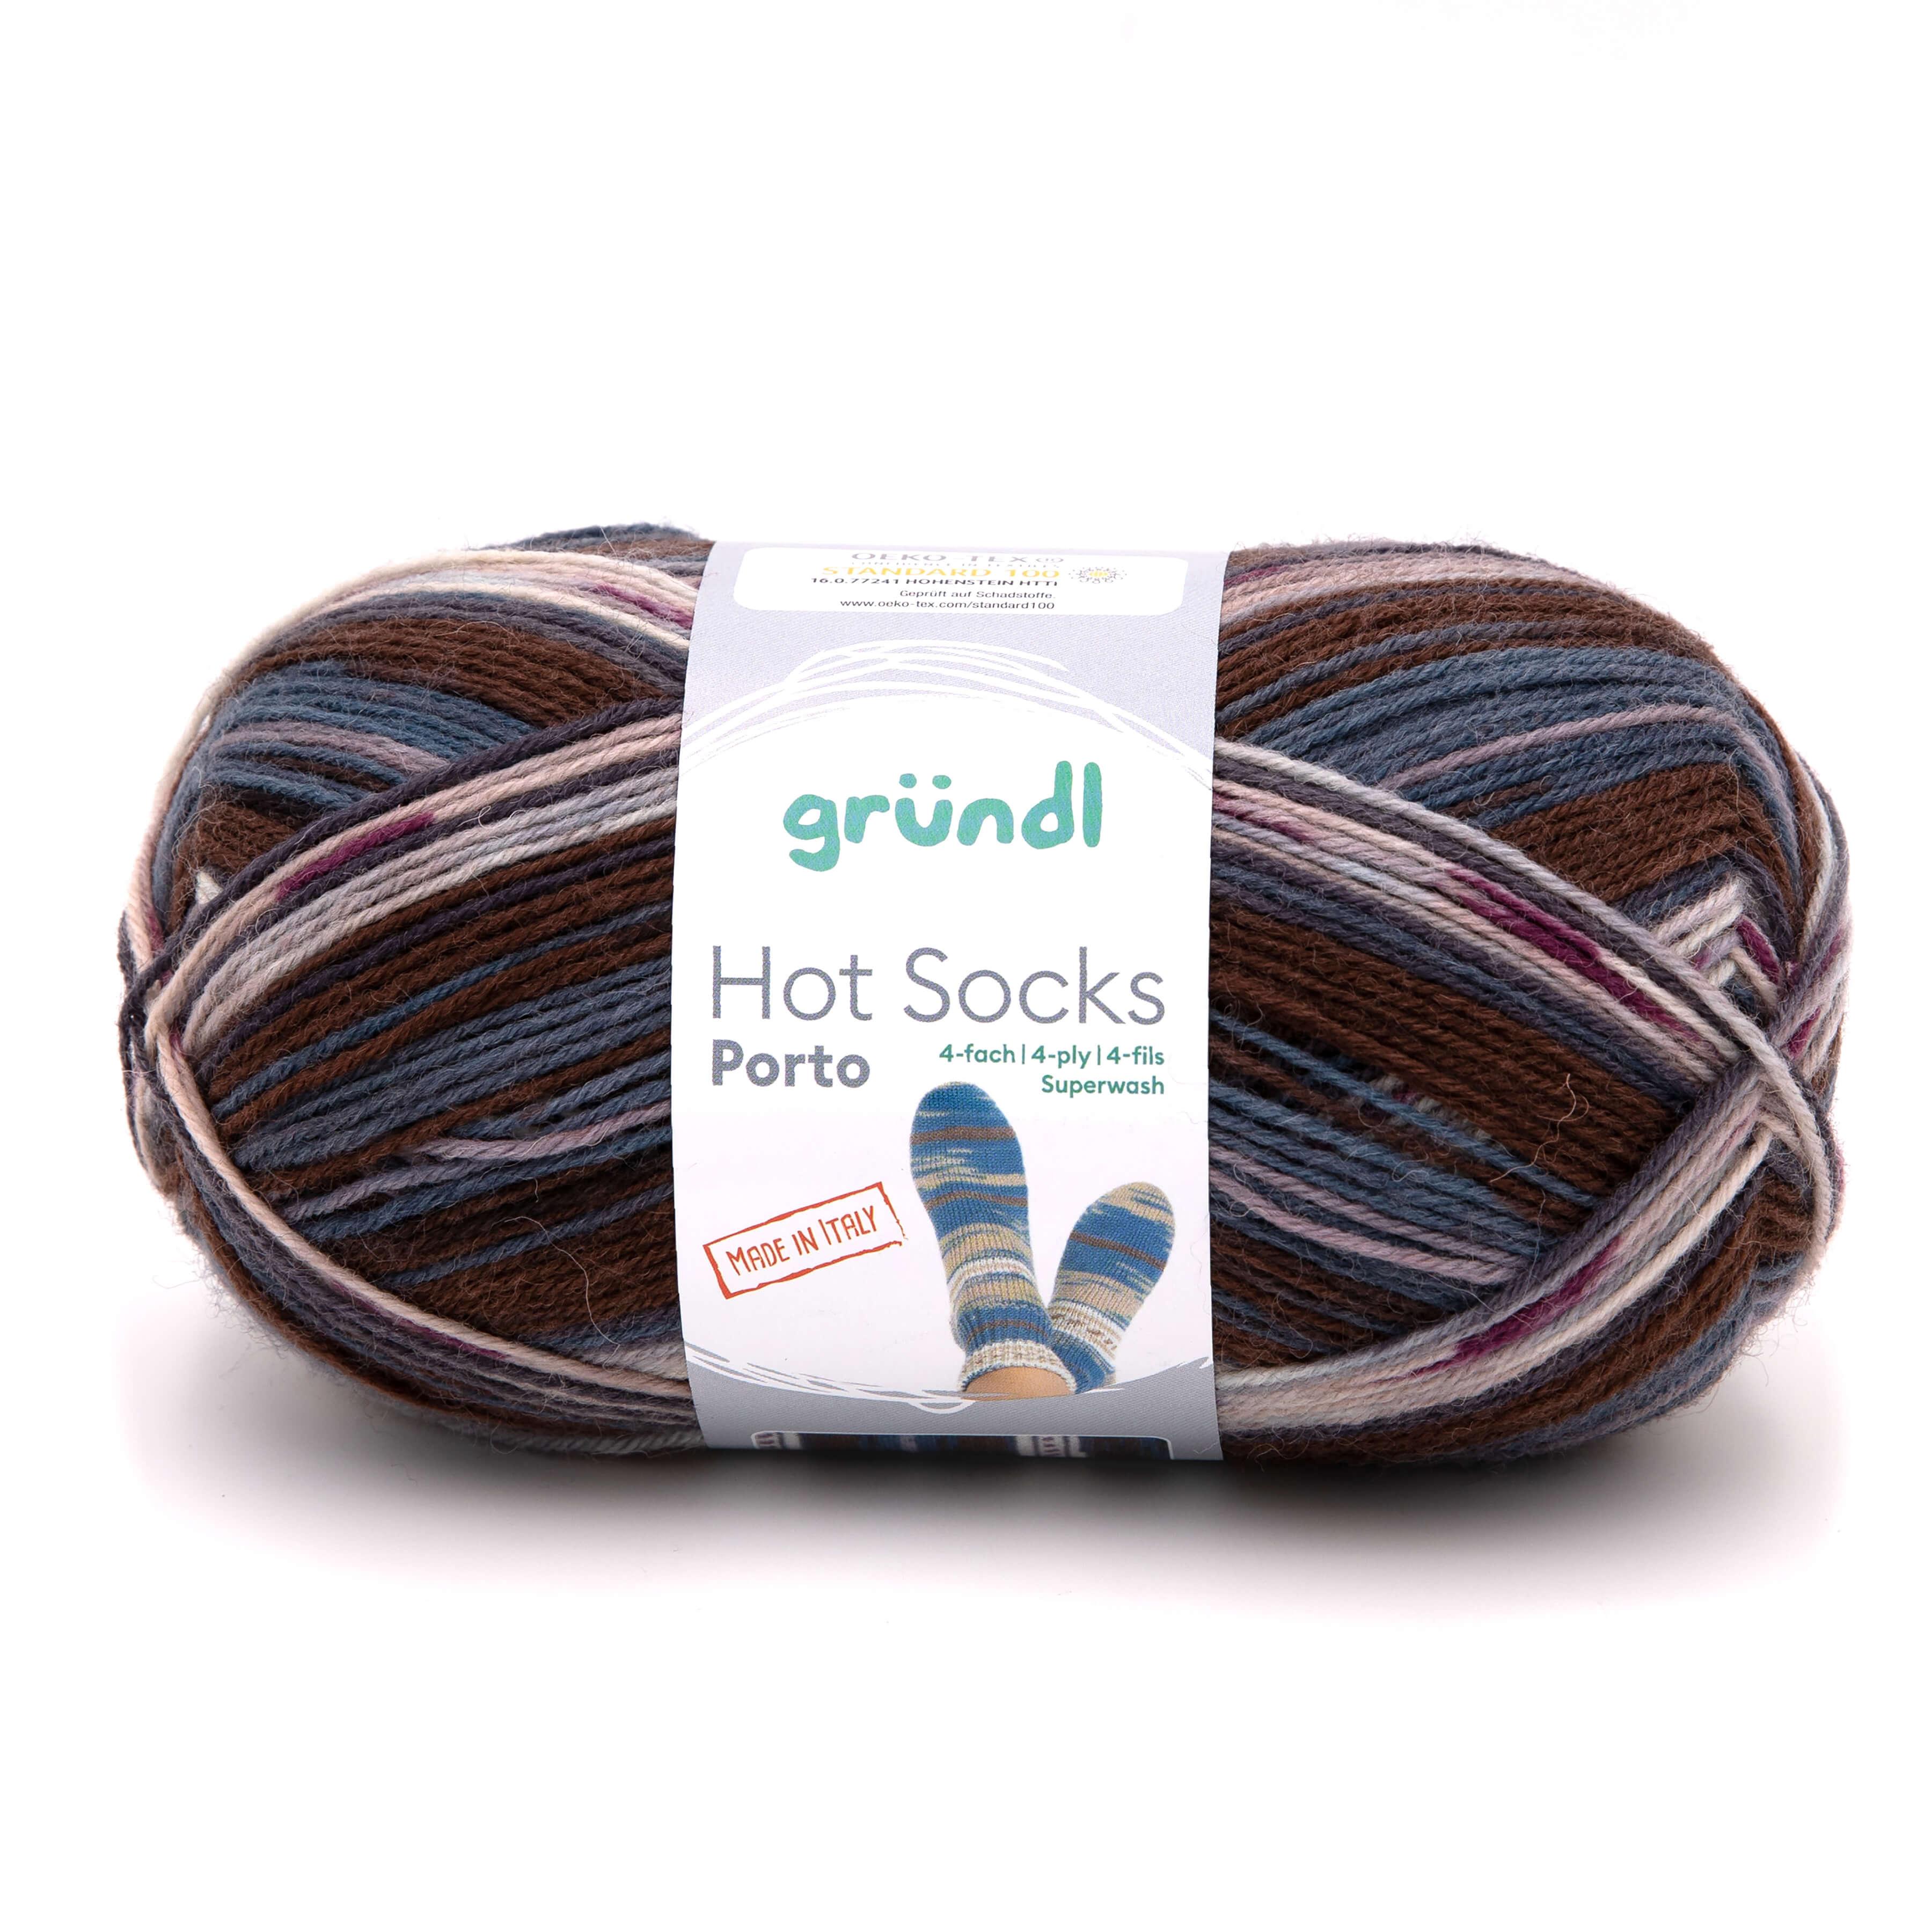 Hot Socks Porto, 4-fach